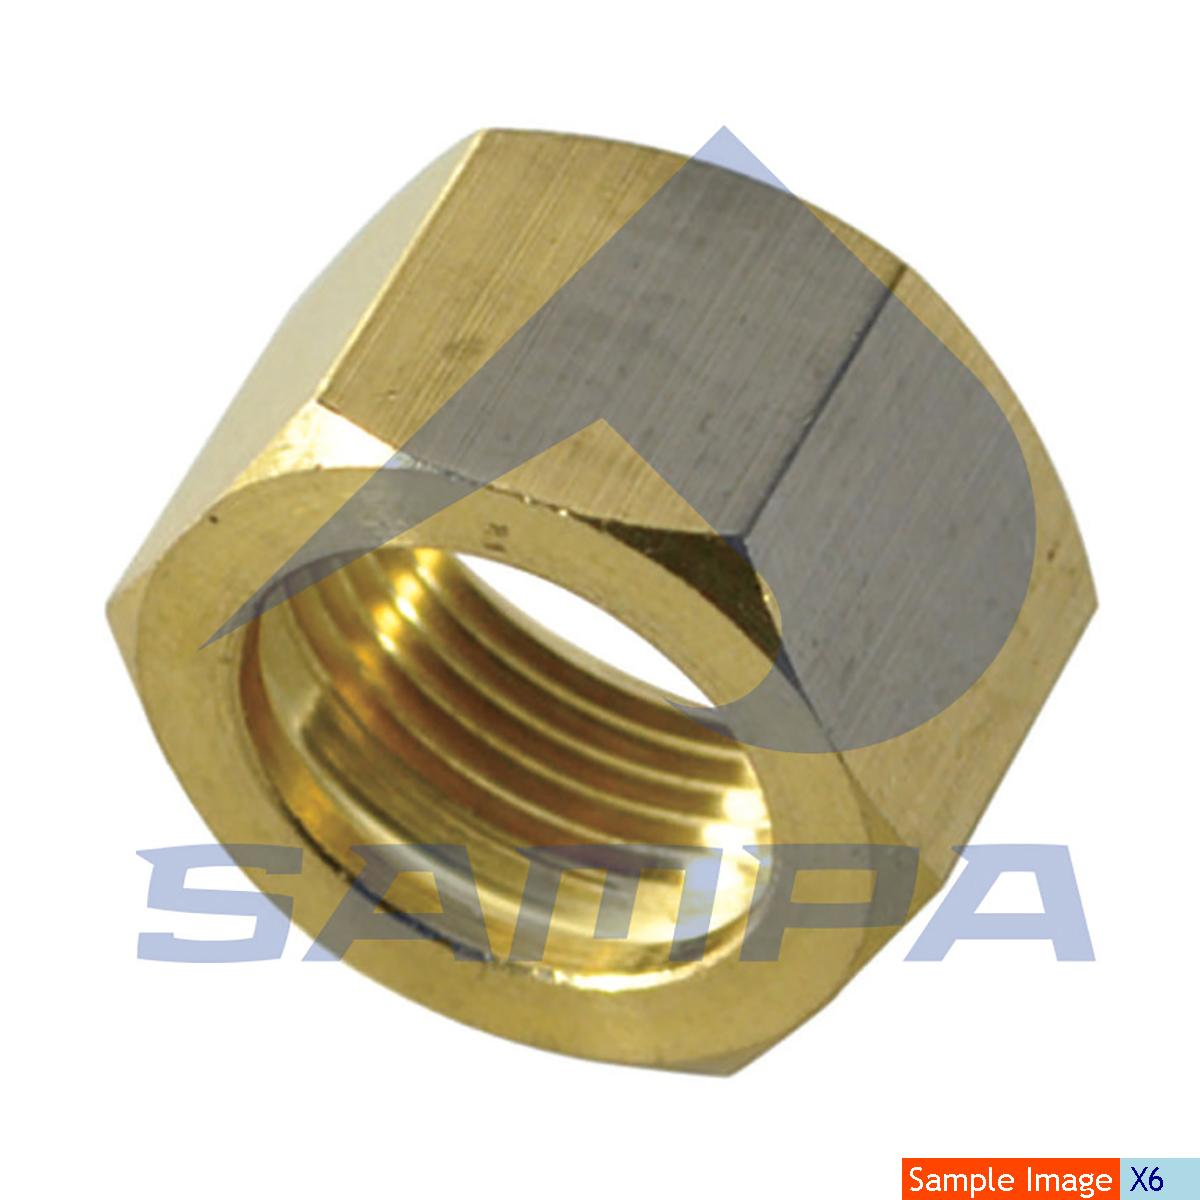 Union Nut, Universal, Universal Parts